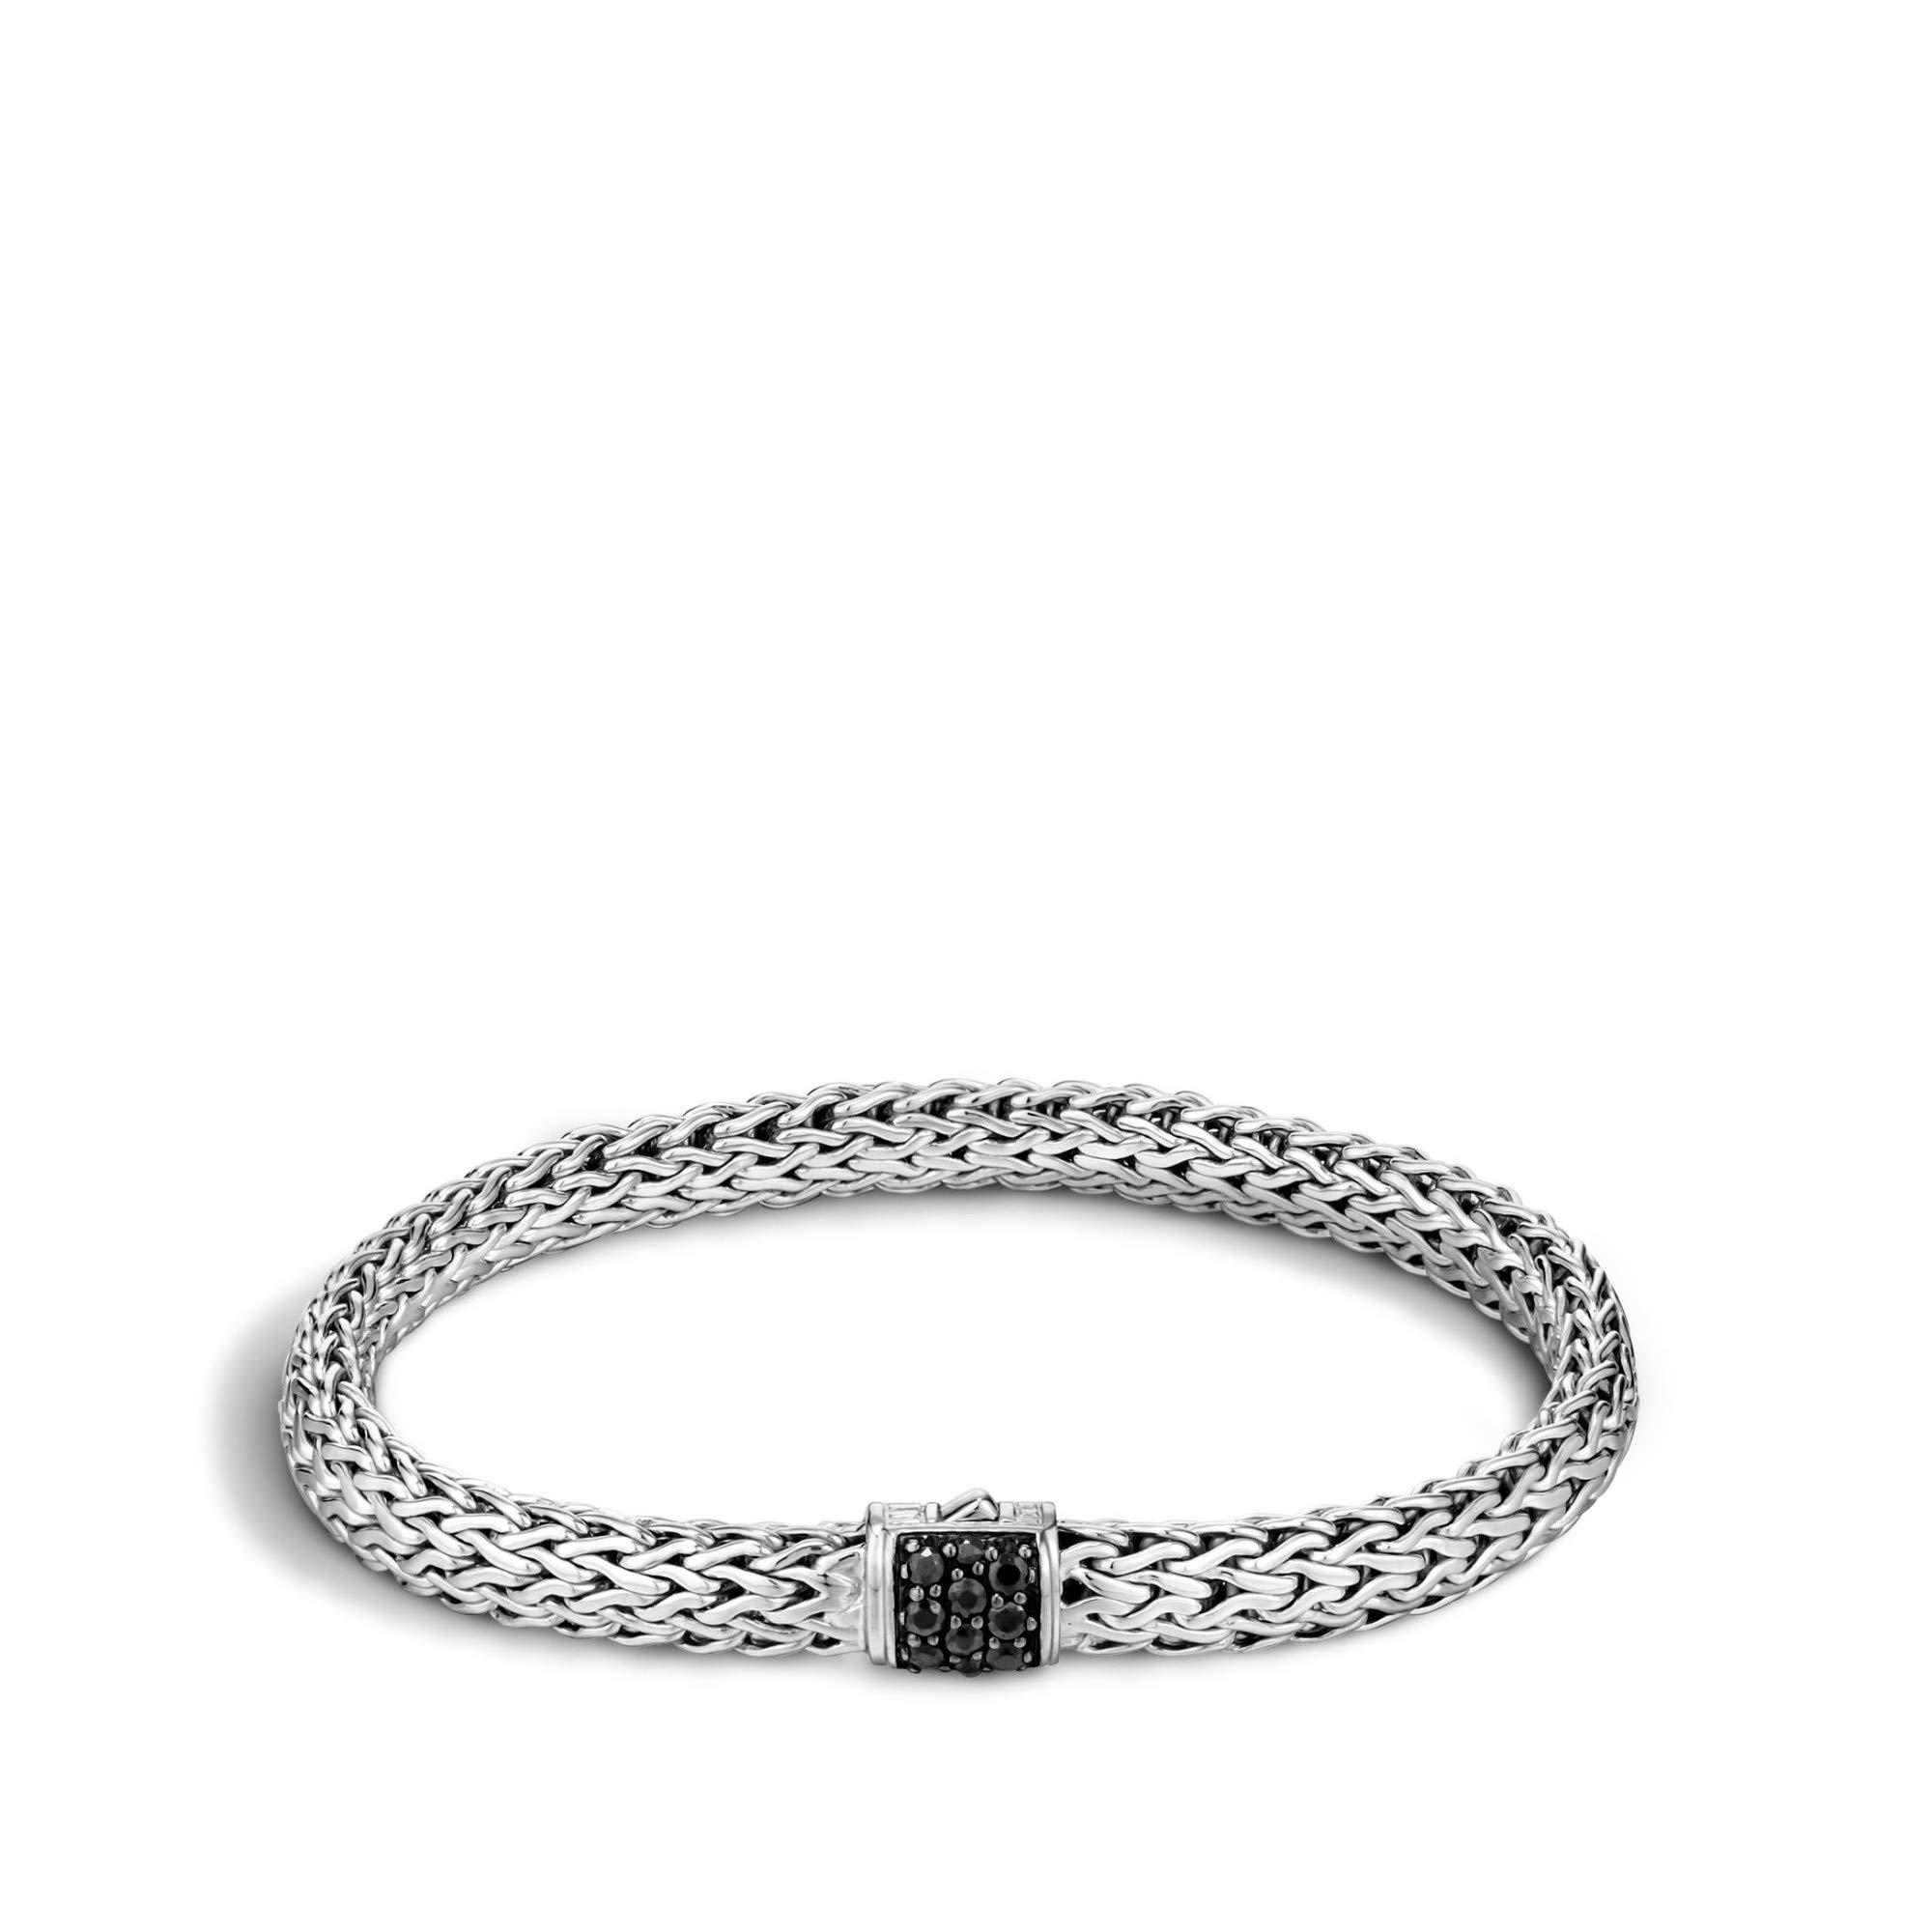 John Hardy Women's Classic Chain Silver Lava Small Bracelet with Black Sapphire, Size M